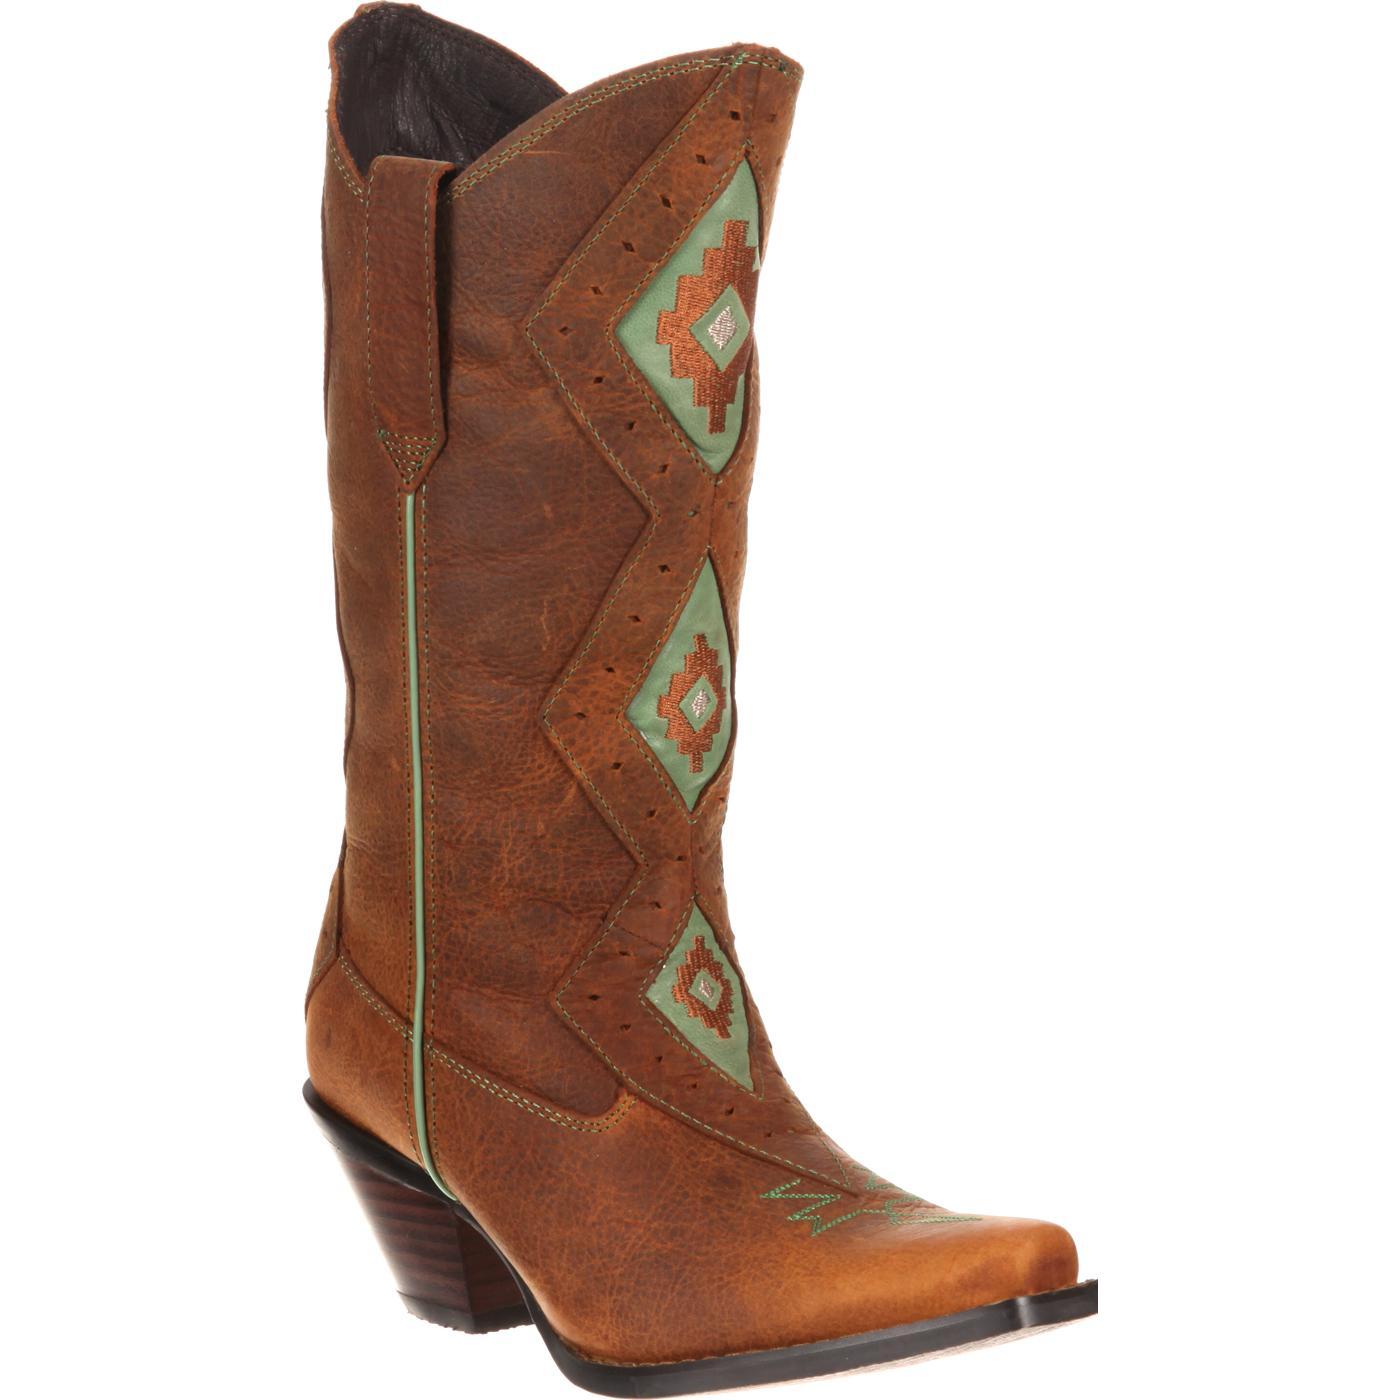 Durango Womens Mint Light Tan Boots Crush 12 Tribal